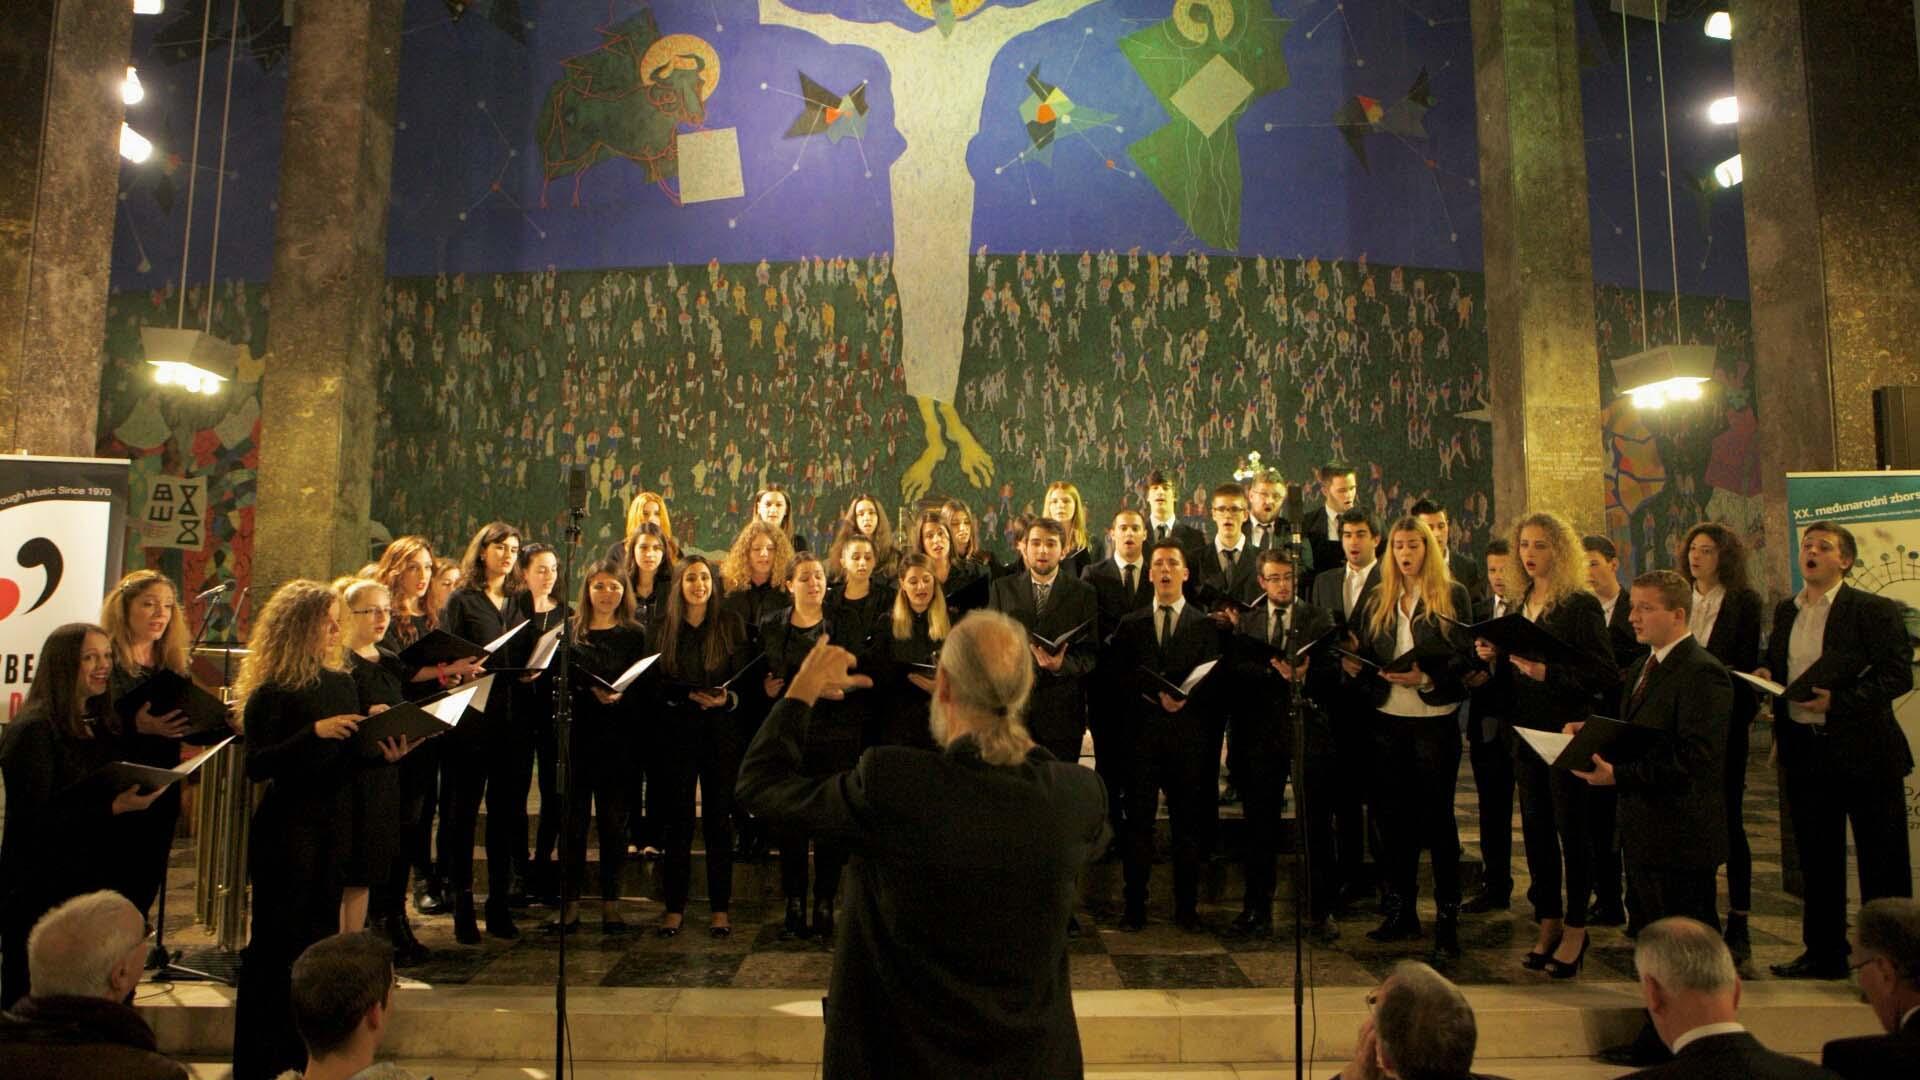 Završen XX. Međunarodni zborski festival CRO PATRIA